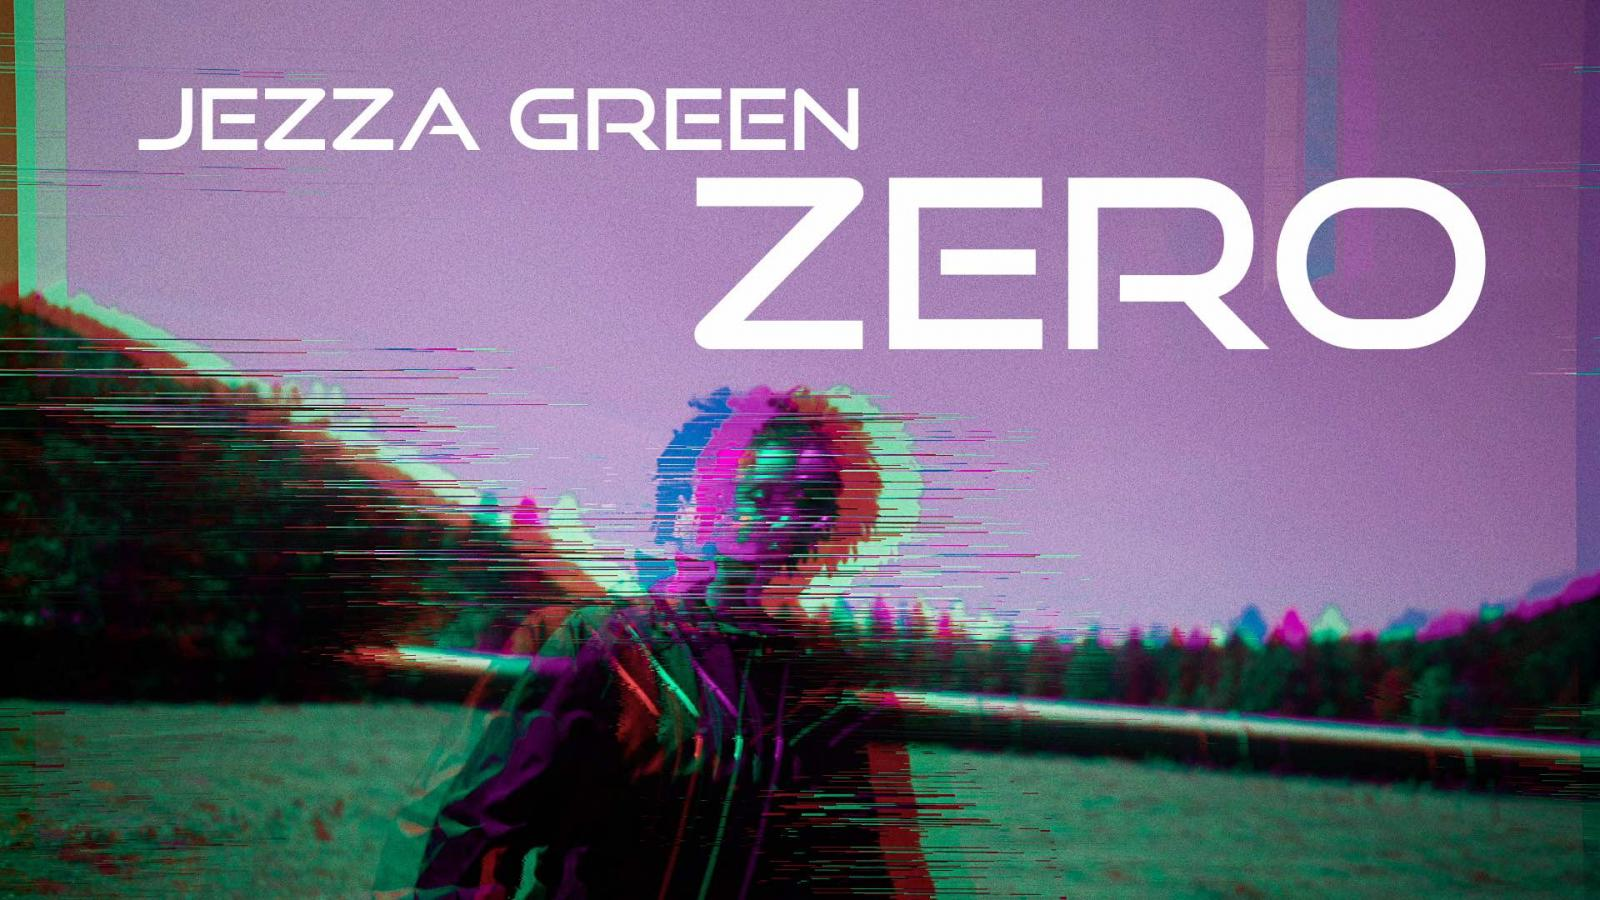 Upcoming: Jezza Green - Zero